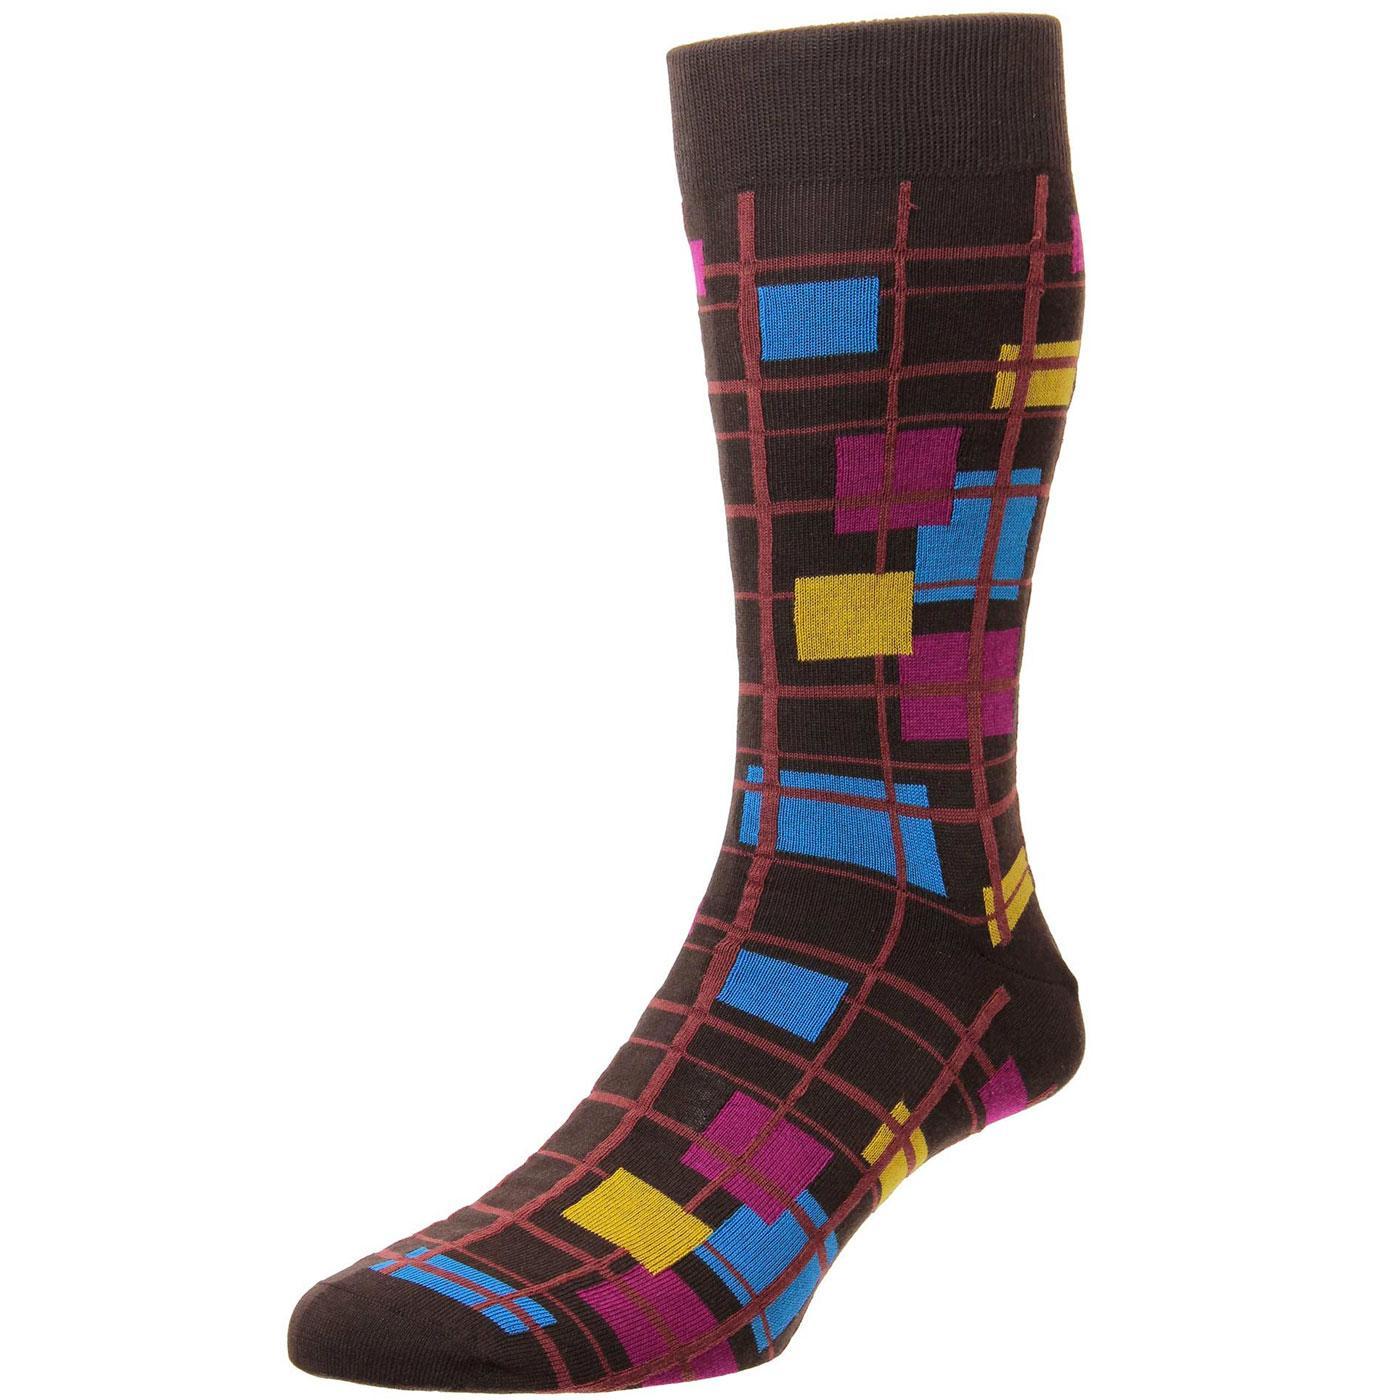 + Wright PANTHERELLA Mondrian Check Socks (Mocha)